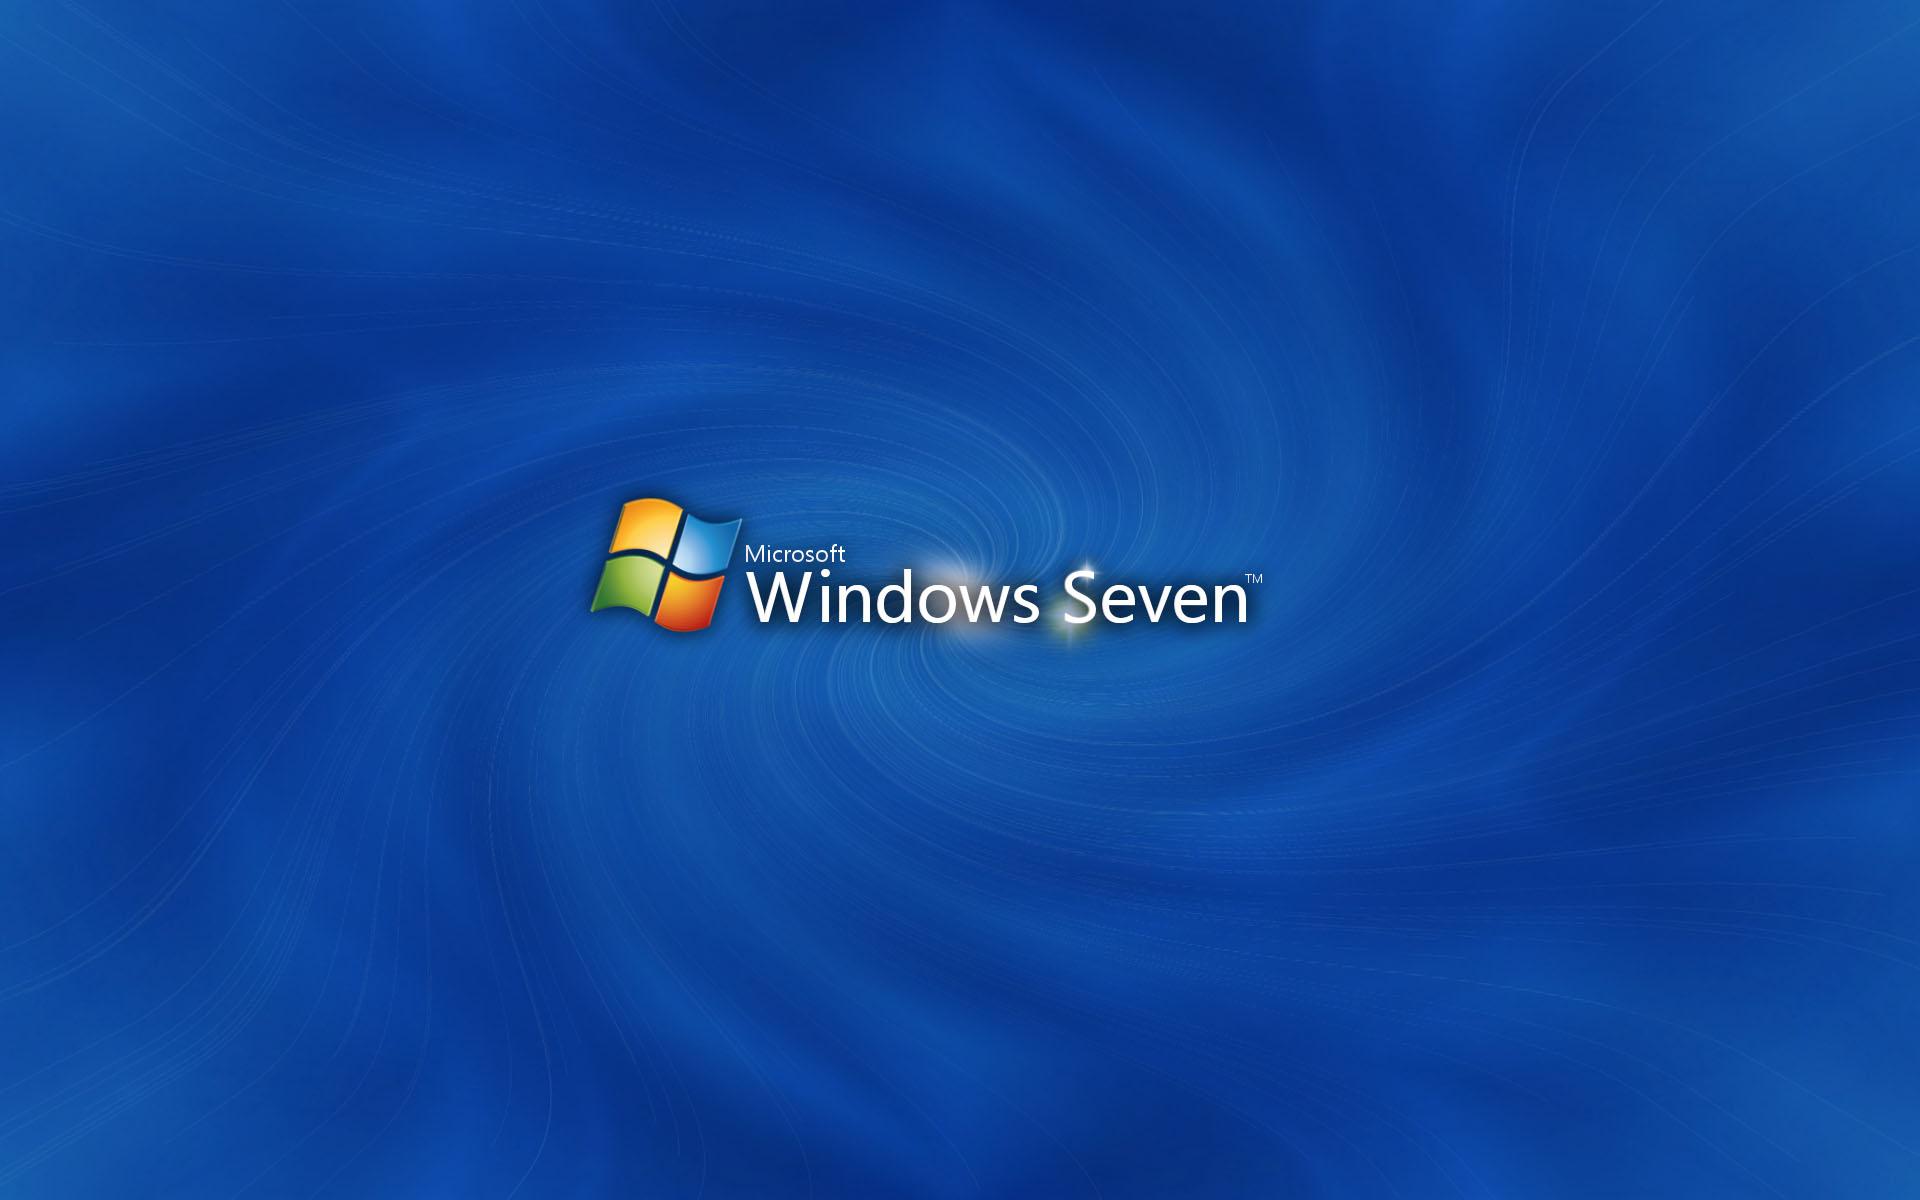 HQ Windows 7 Ultimate 51 Wallpaper   HQ Wallpapers 1920x1200